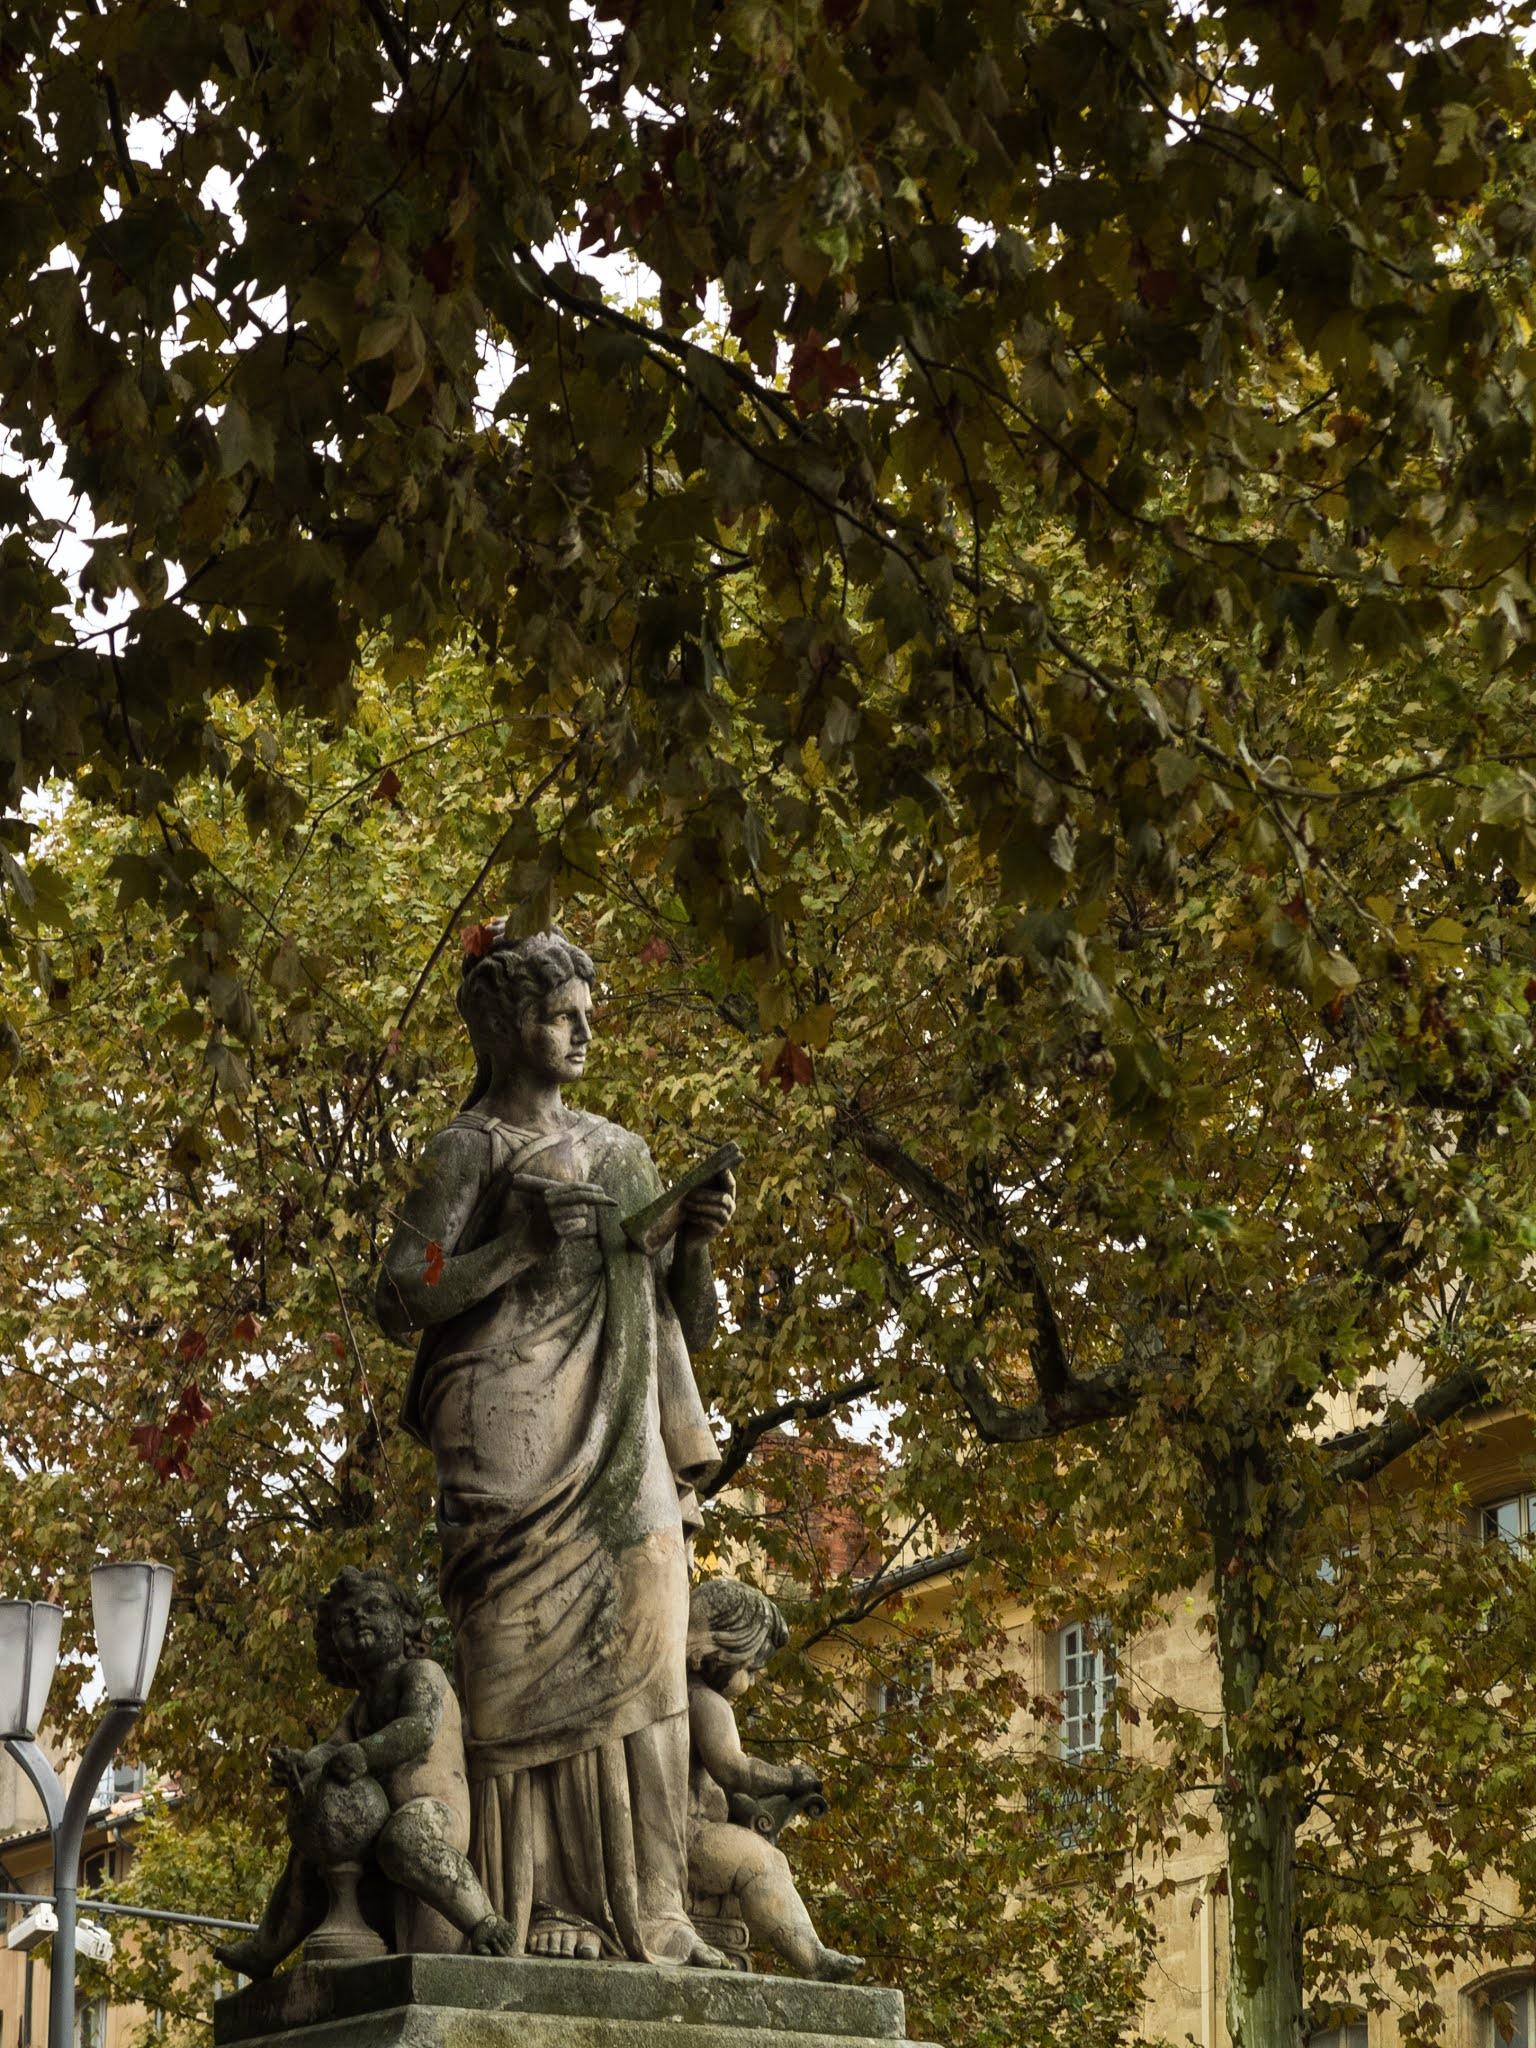 Arts et Sciences Statues on Cours Mirabeau in Aix-en-Provence, Southern France.